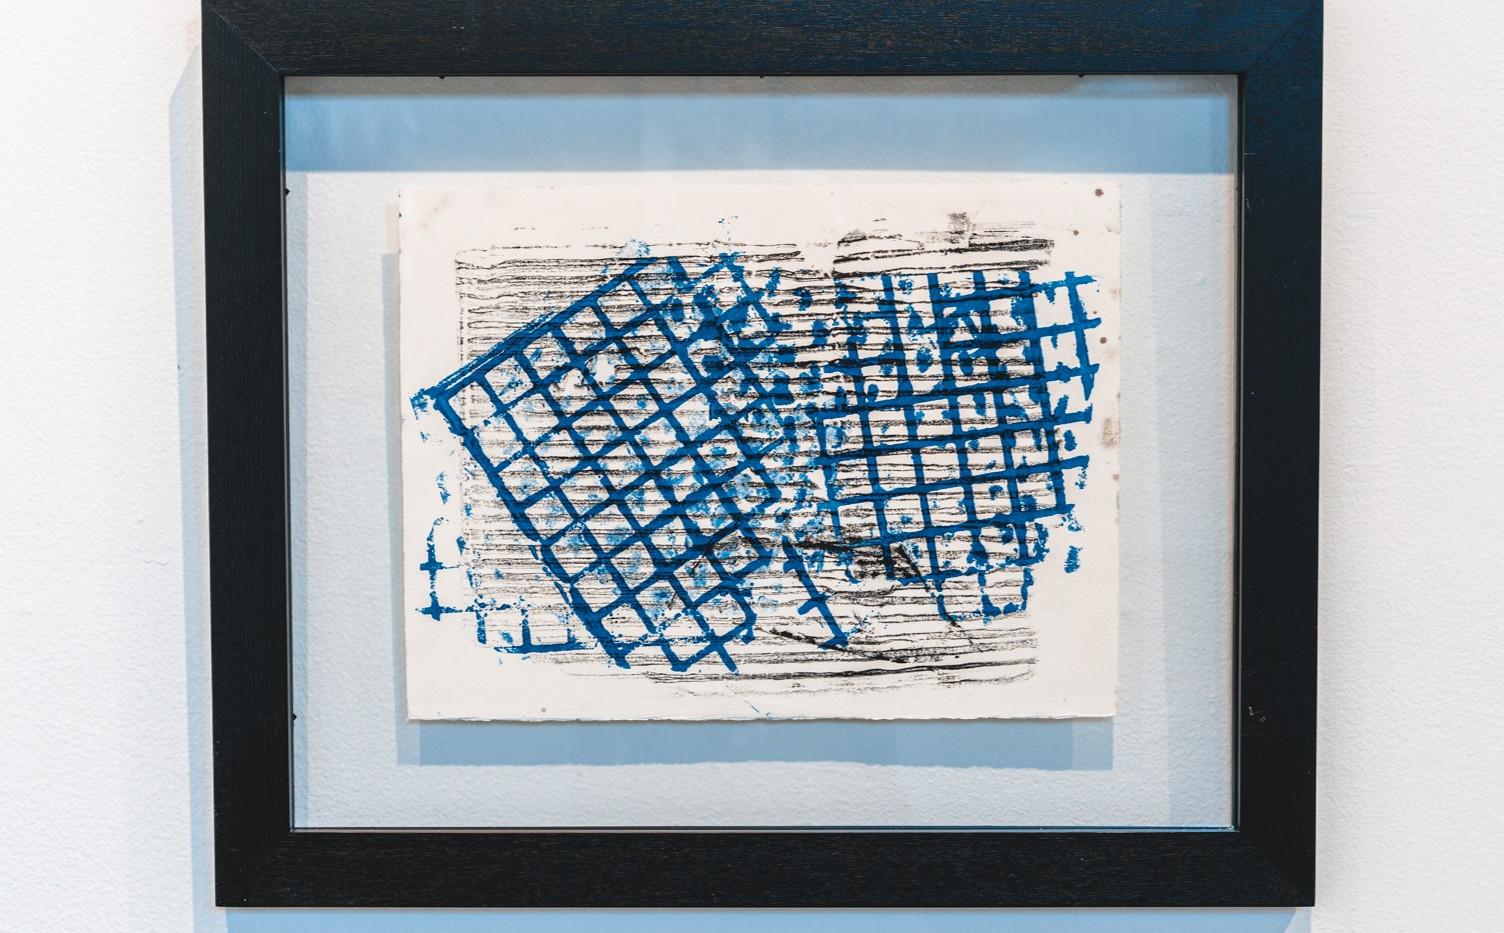 "IRA TATTELMAN  ""Bridging the Vardar River"" Monoprint on Fabriano Tiepolo paper 18.75"" x 22.75"" framed 2019 $425  Photograph by StereoVision"